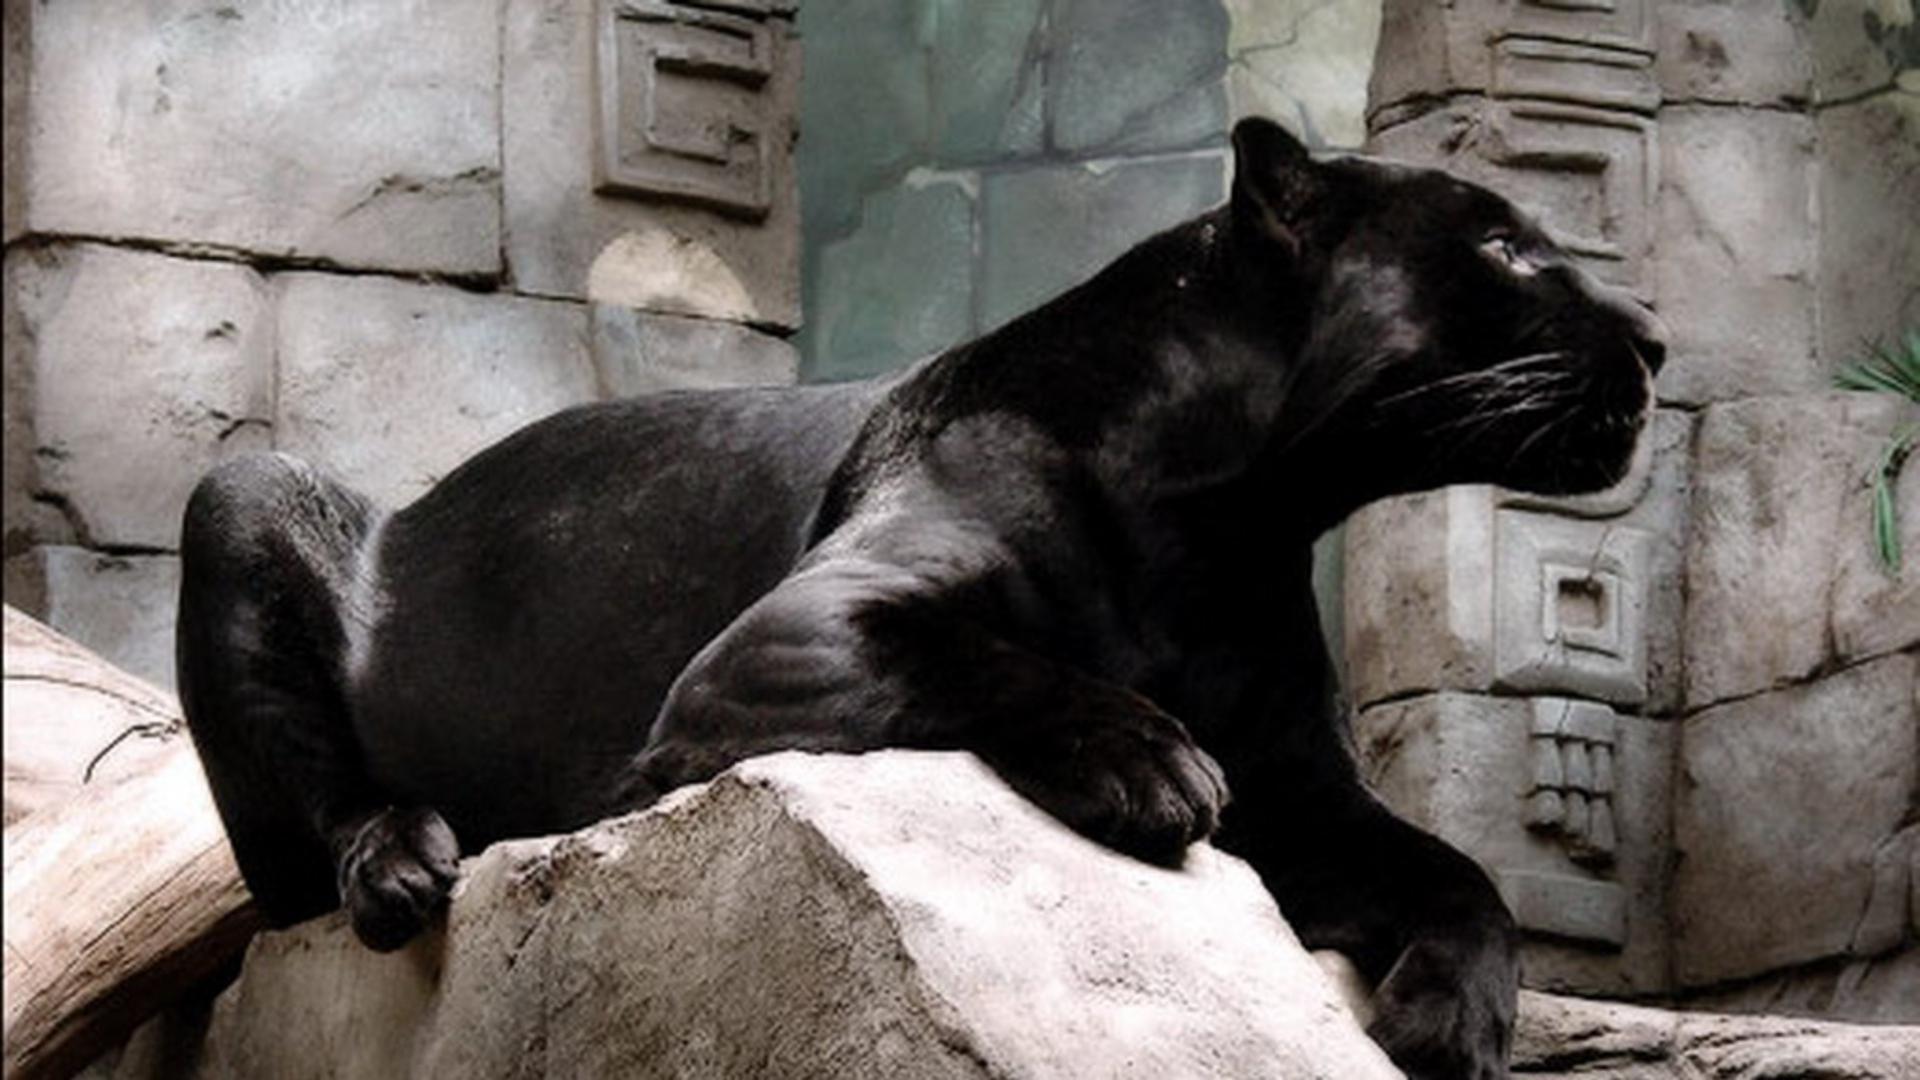 Black Panther Animal Wallpaper Temple Cat Hd Desktop Wallpaper Widescreen High